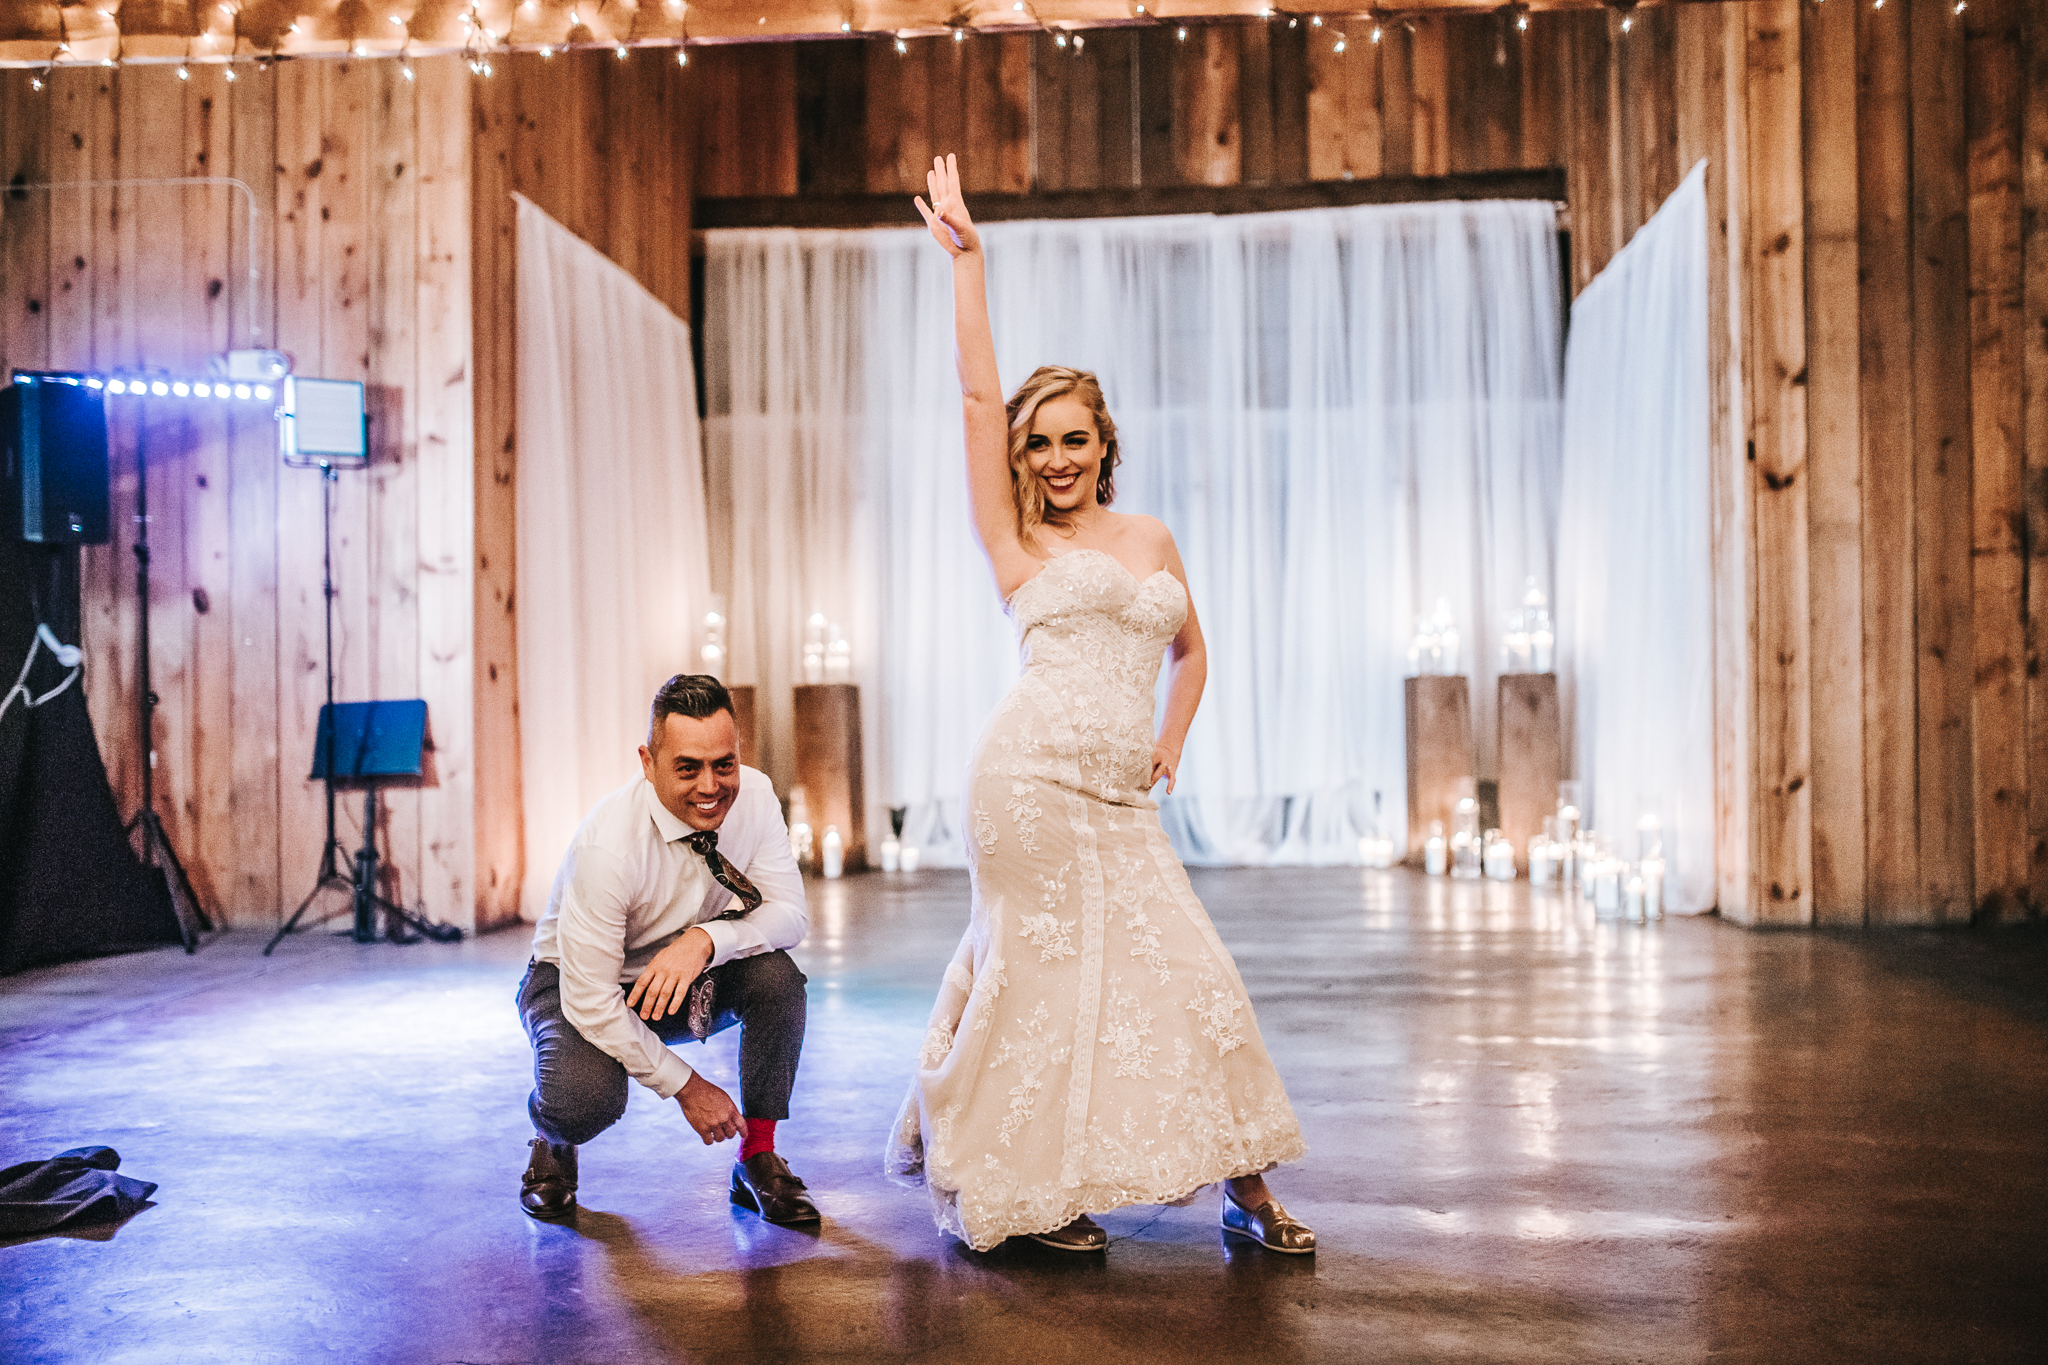 0170 Ariana Jordan Photo - Cameron & Lauren's Wedding at Talon Winery  7715.jpg